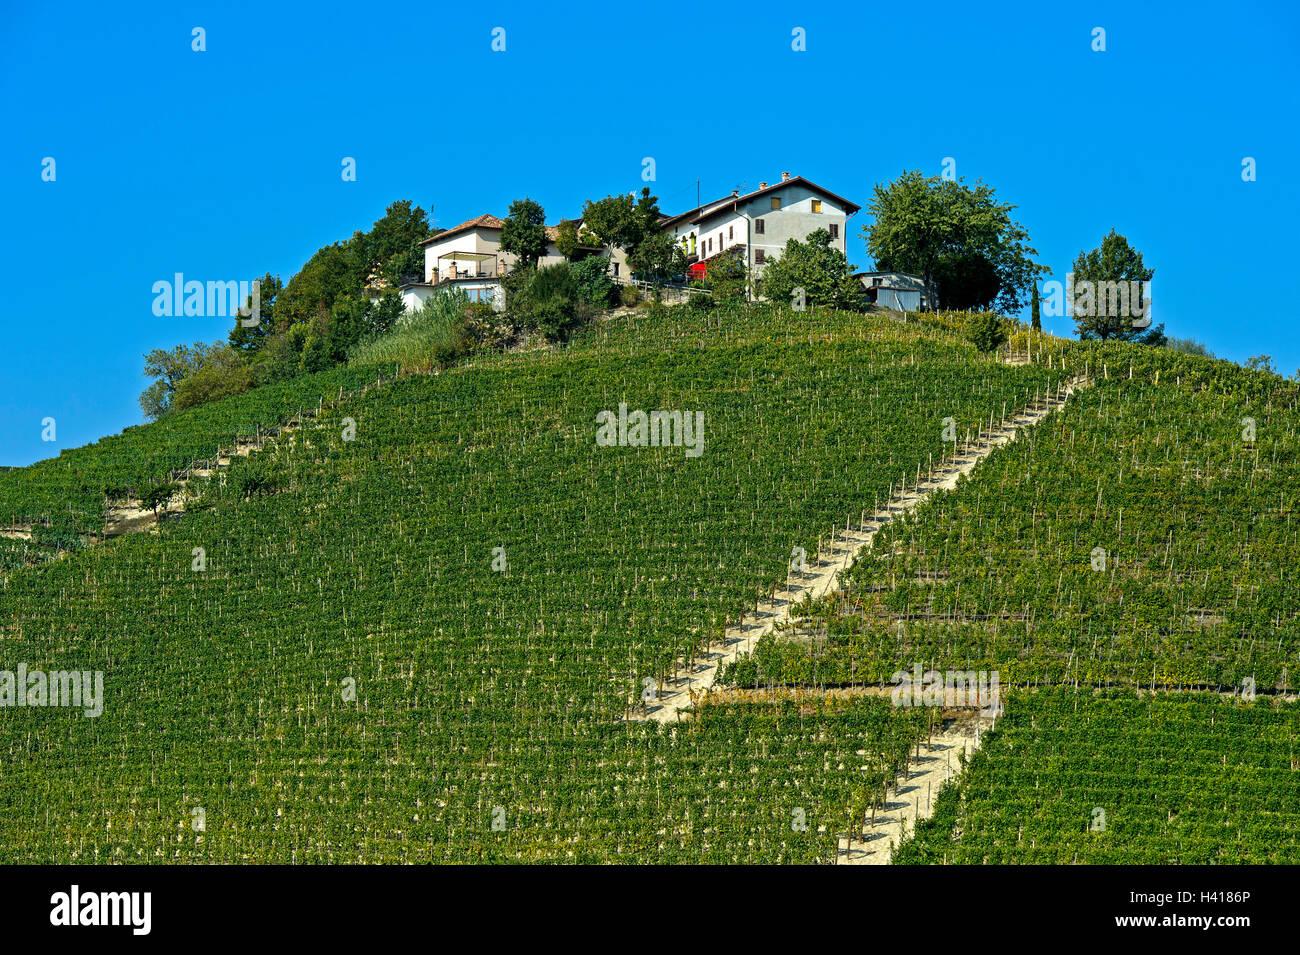 Vineyards of Nebbiolo grapes for Barbaresco red wine in the producing area Barbaresco, Montestefano, Barbaresco, - Stock Image